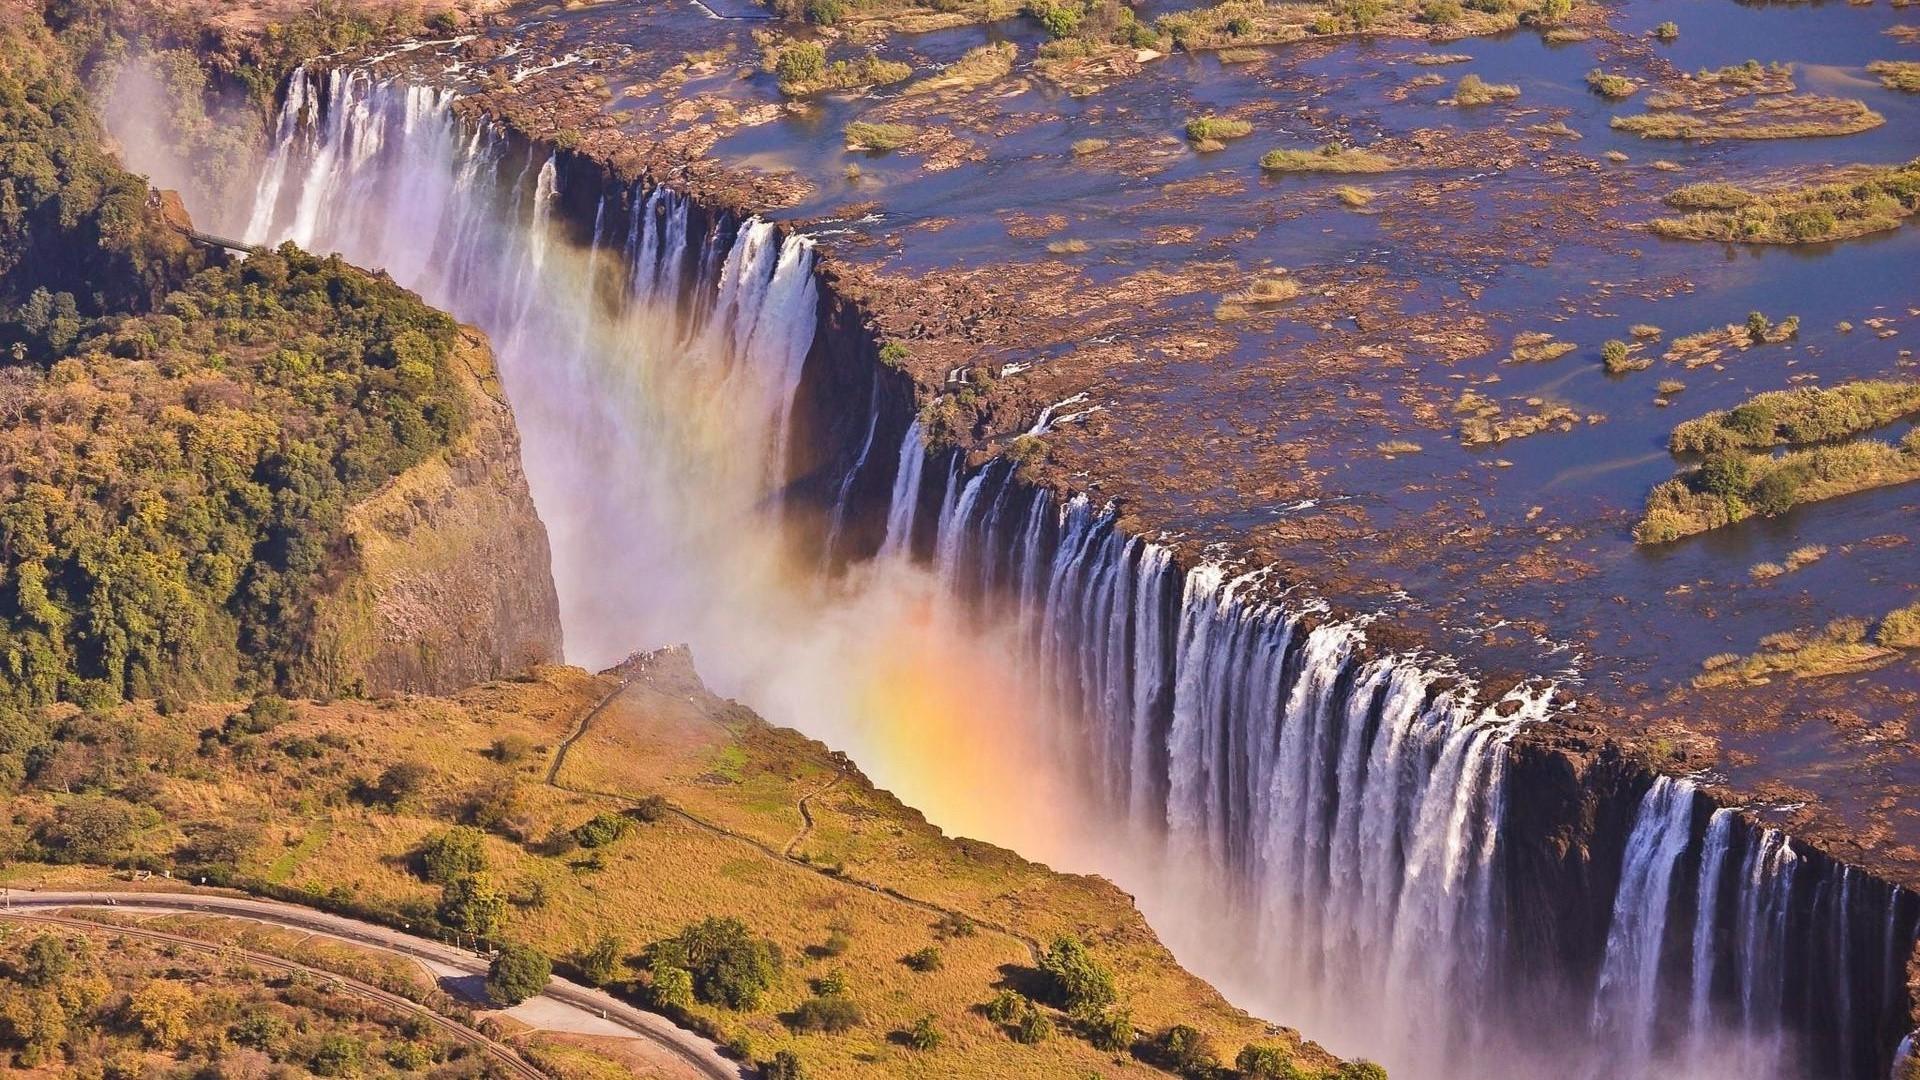 Victoria Falls Zambia wallpaper   591777 1920x1080